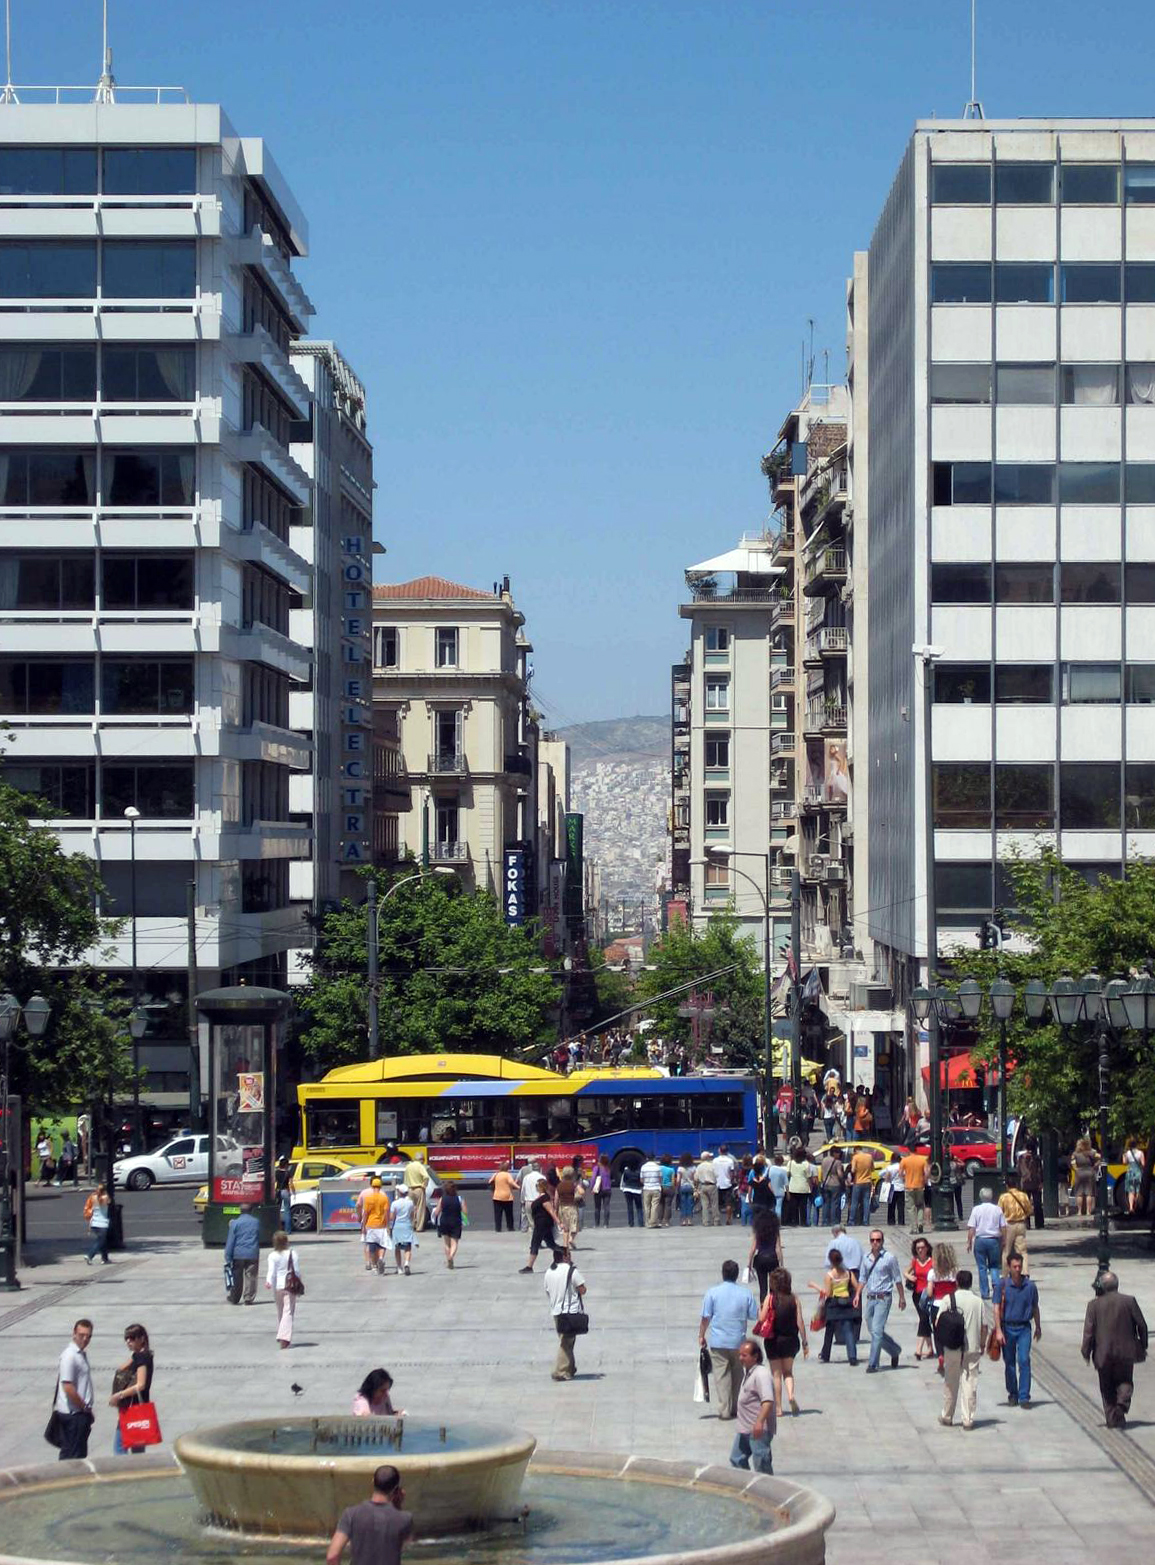 Einkaufstraße Odos Ermou